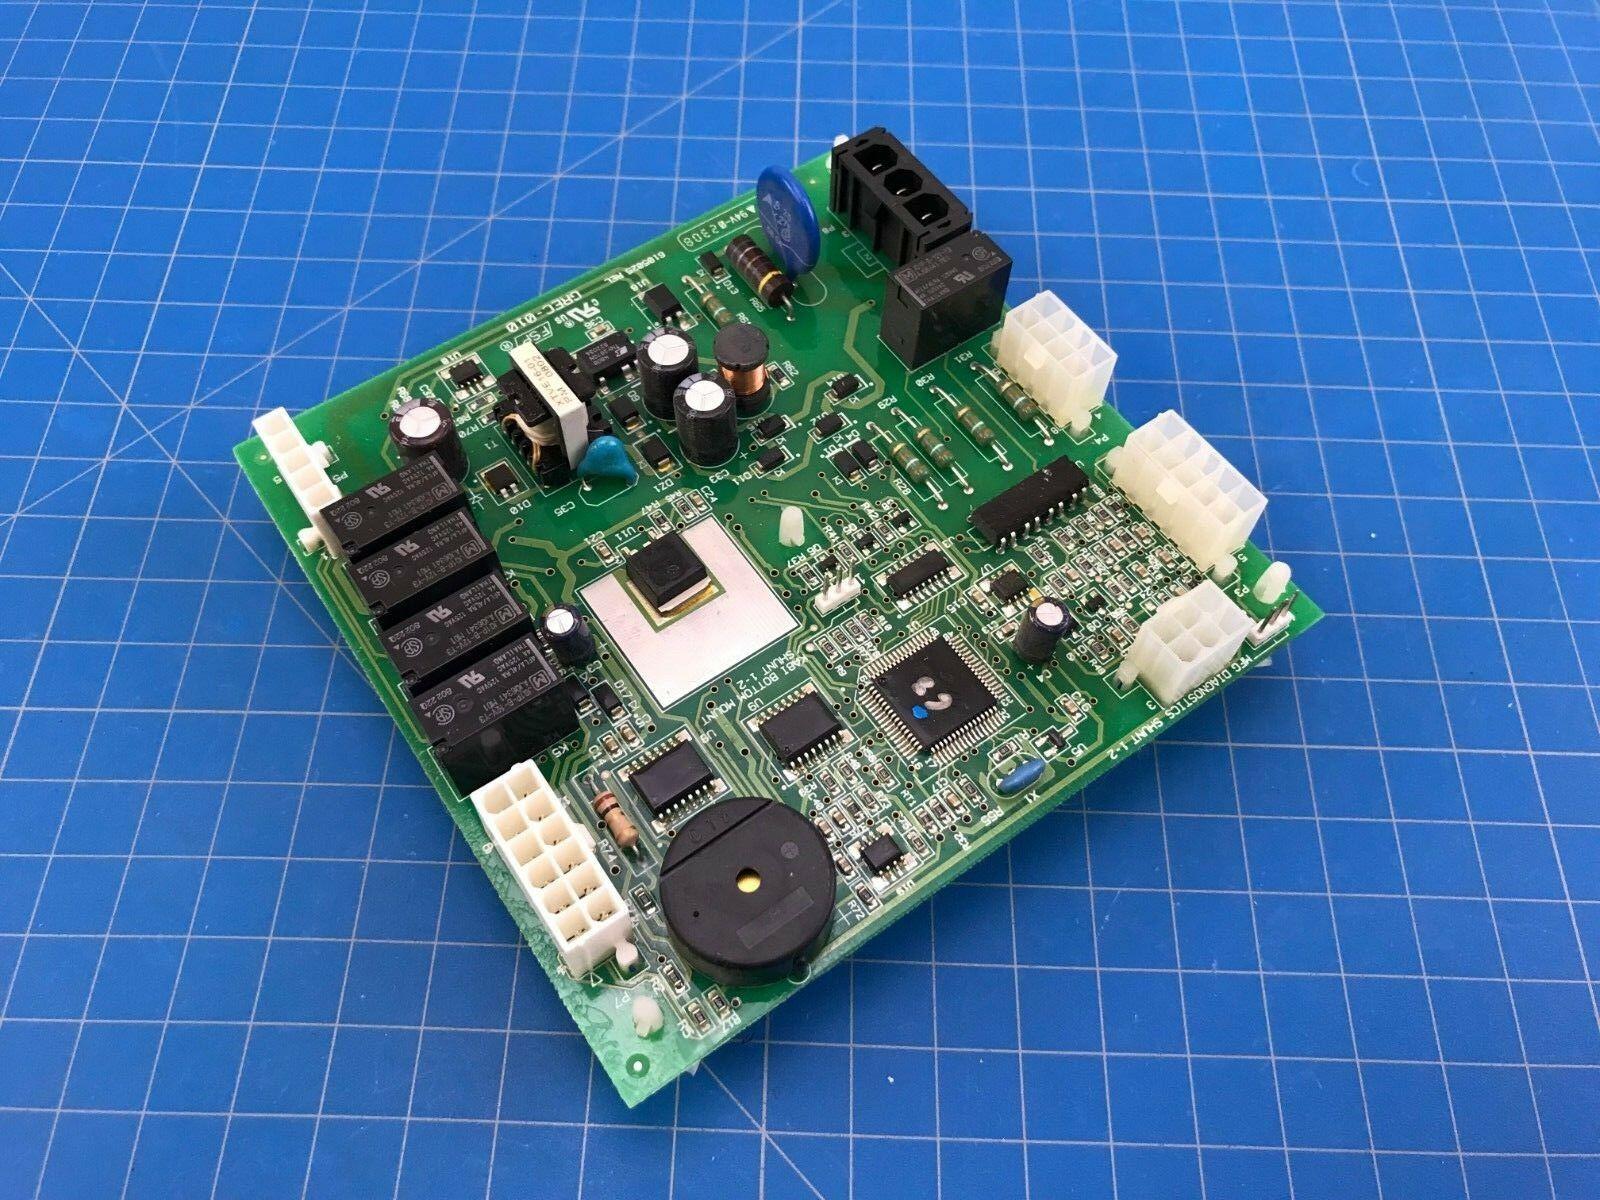 Genuine KitchenAid Refrigerator Main Control Board W10219463 W10185291 2223443